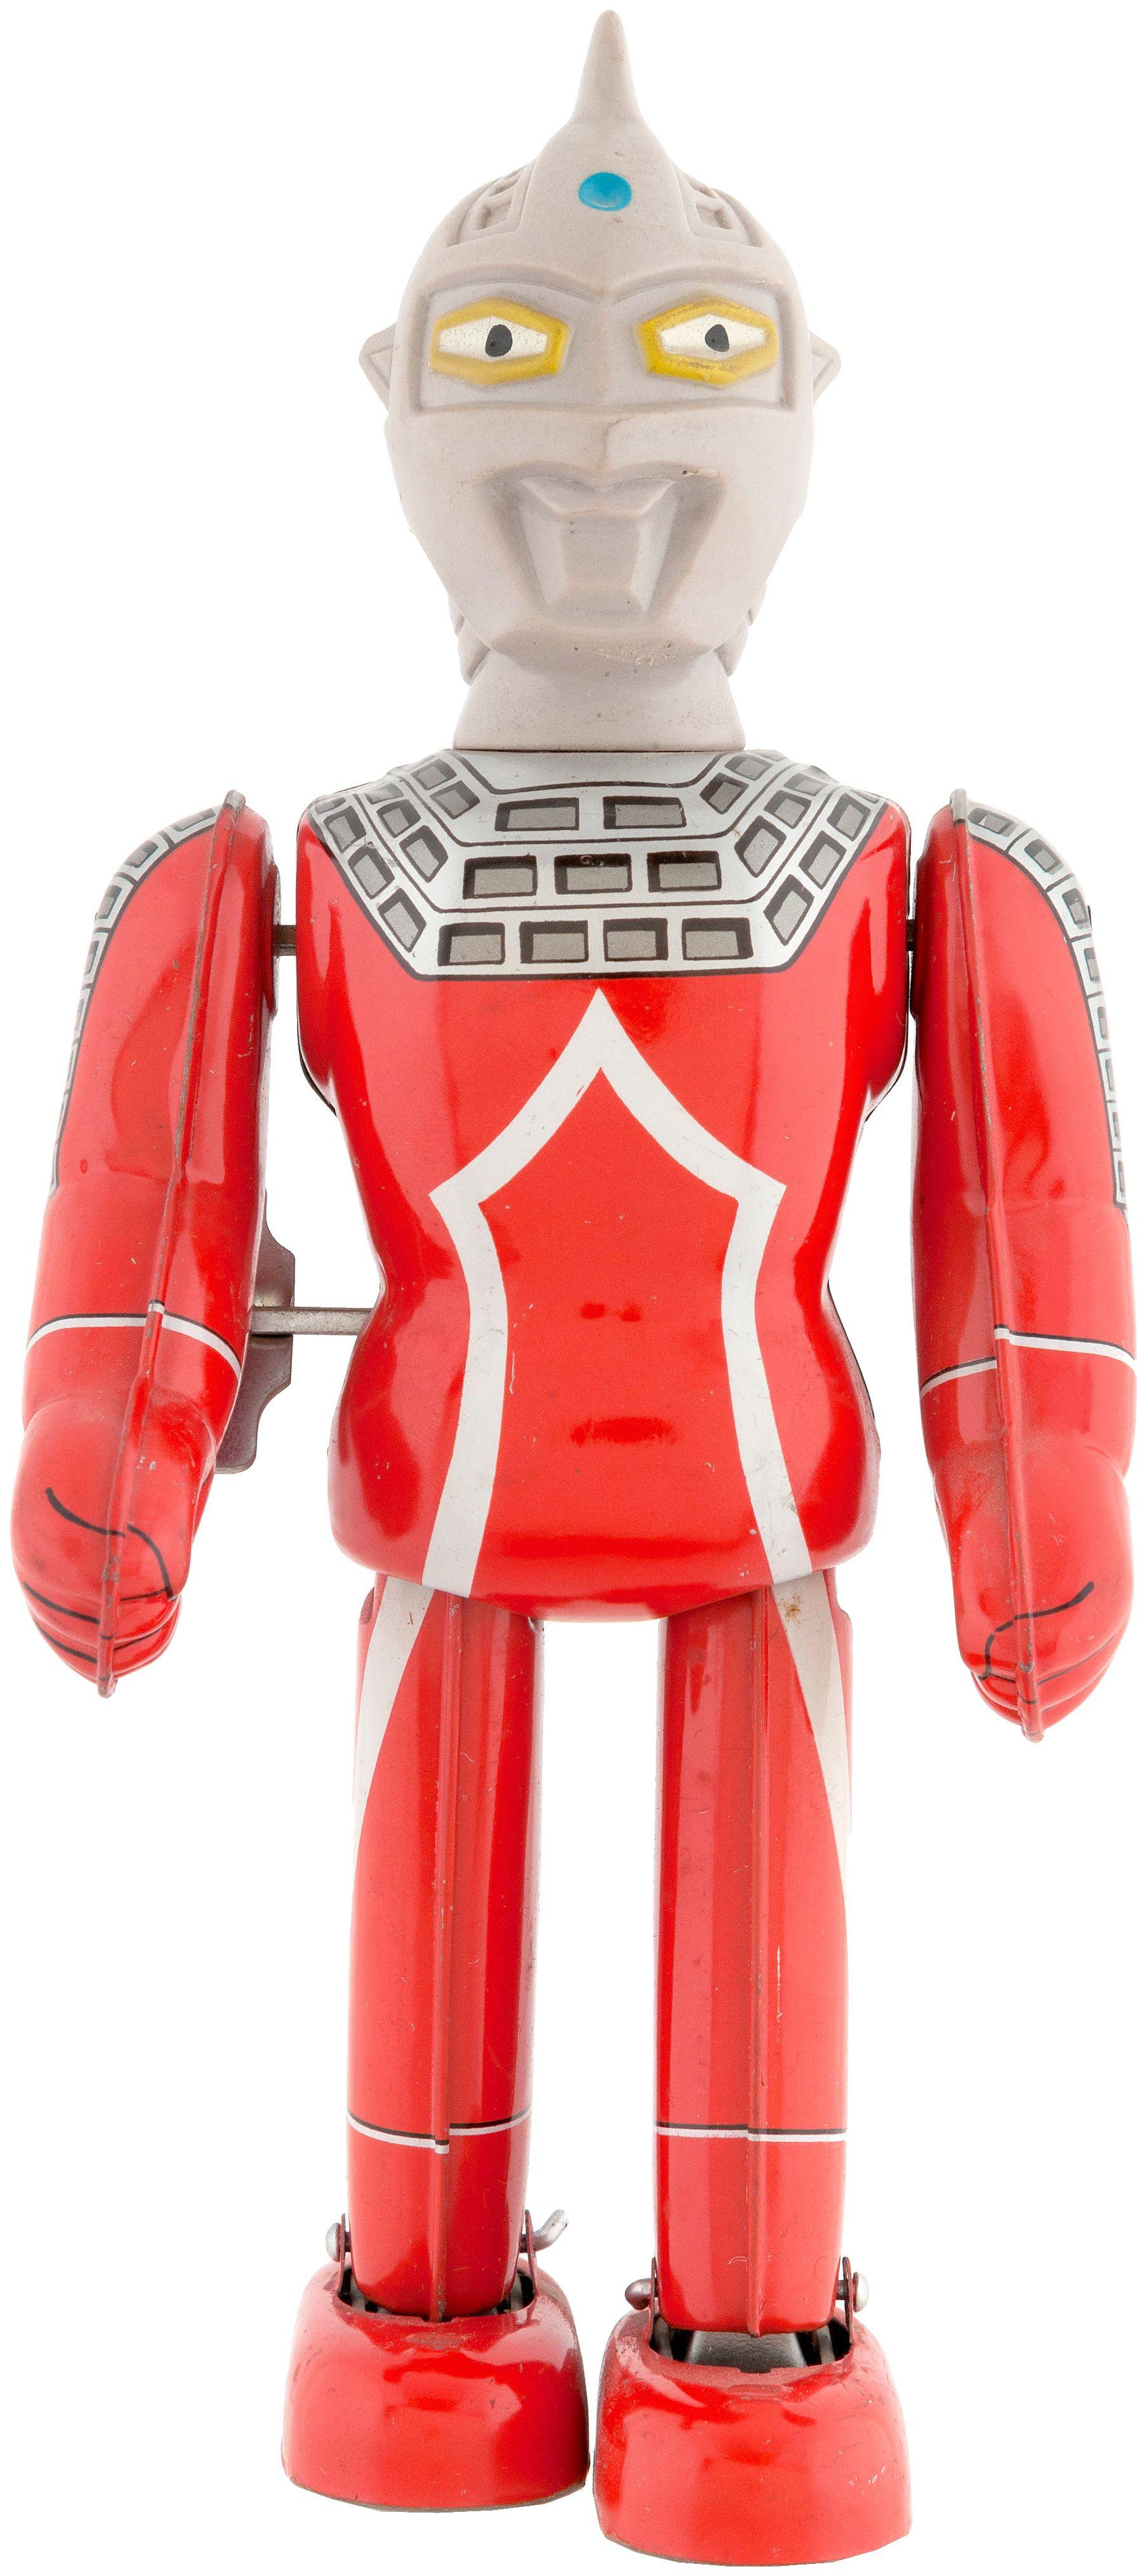 Bullmark wind-up Ultraman toy